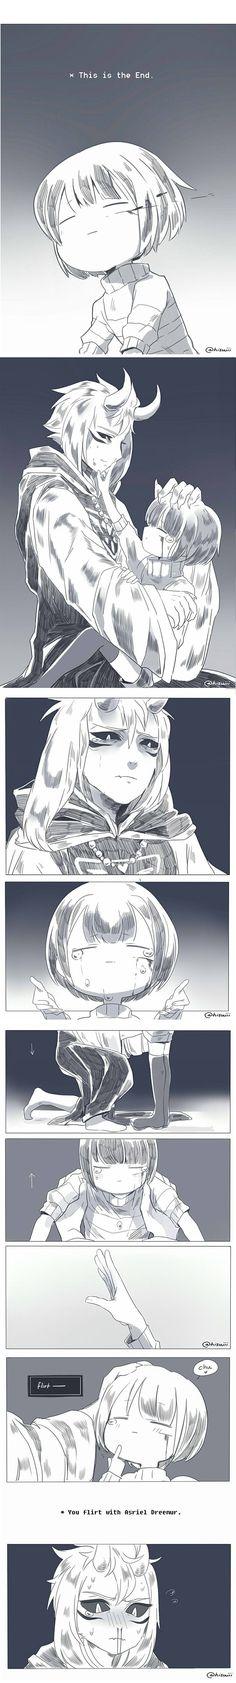 Asriel x Frisk